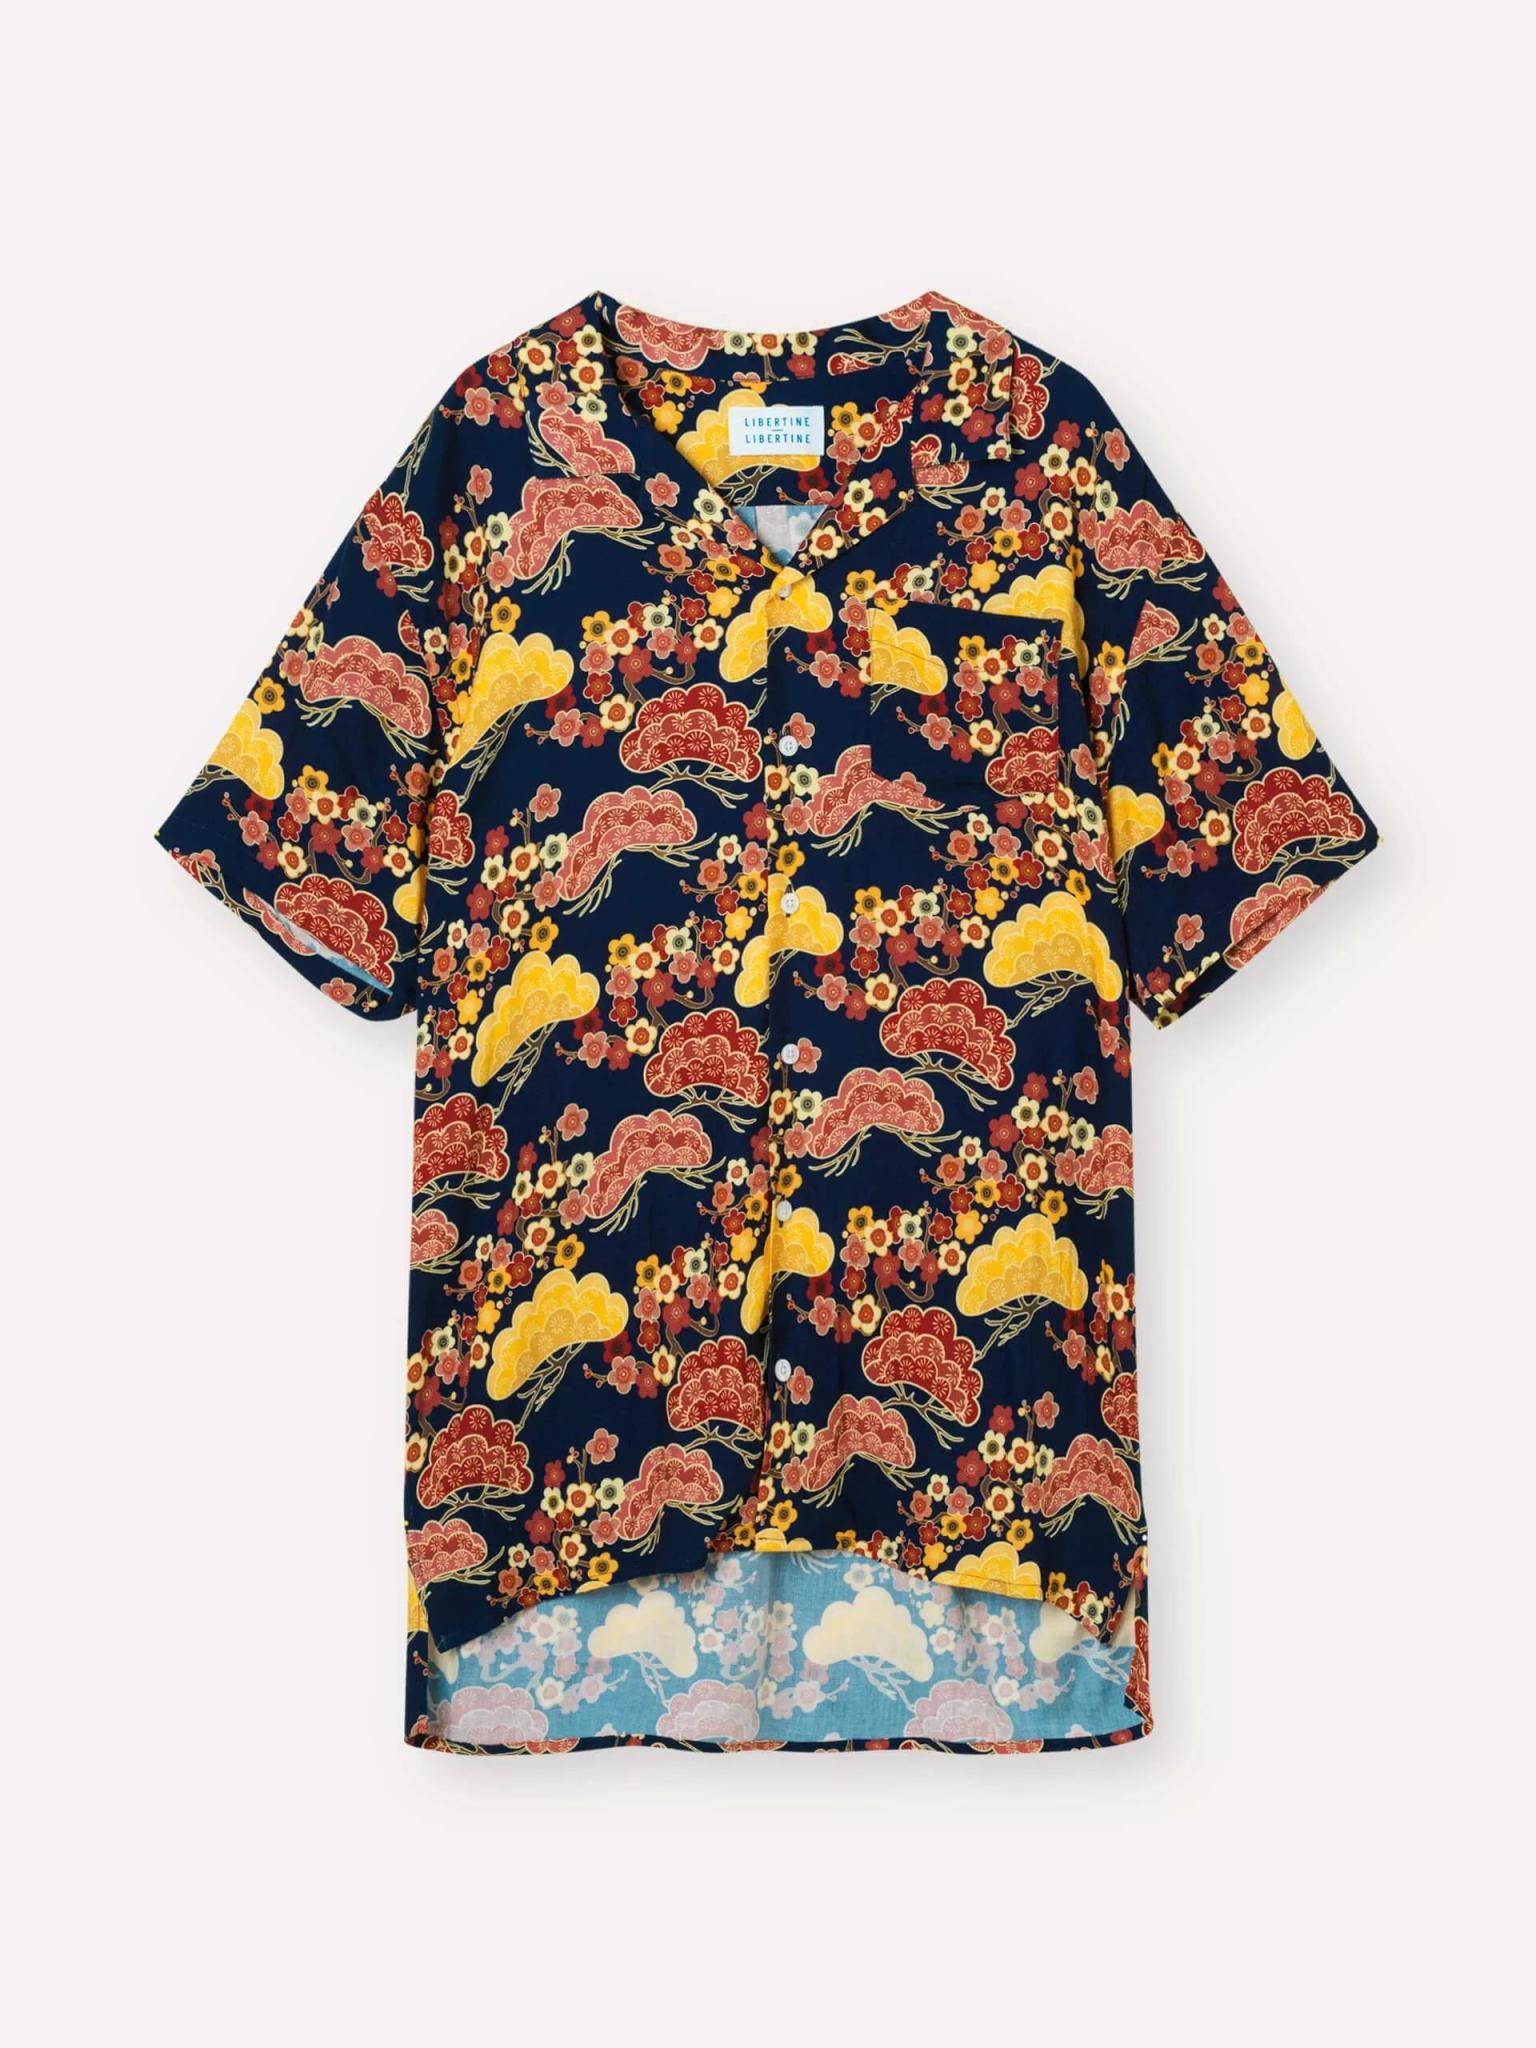 Cave Short Sleeve Asian Sky Blue Shirt-1